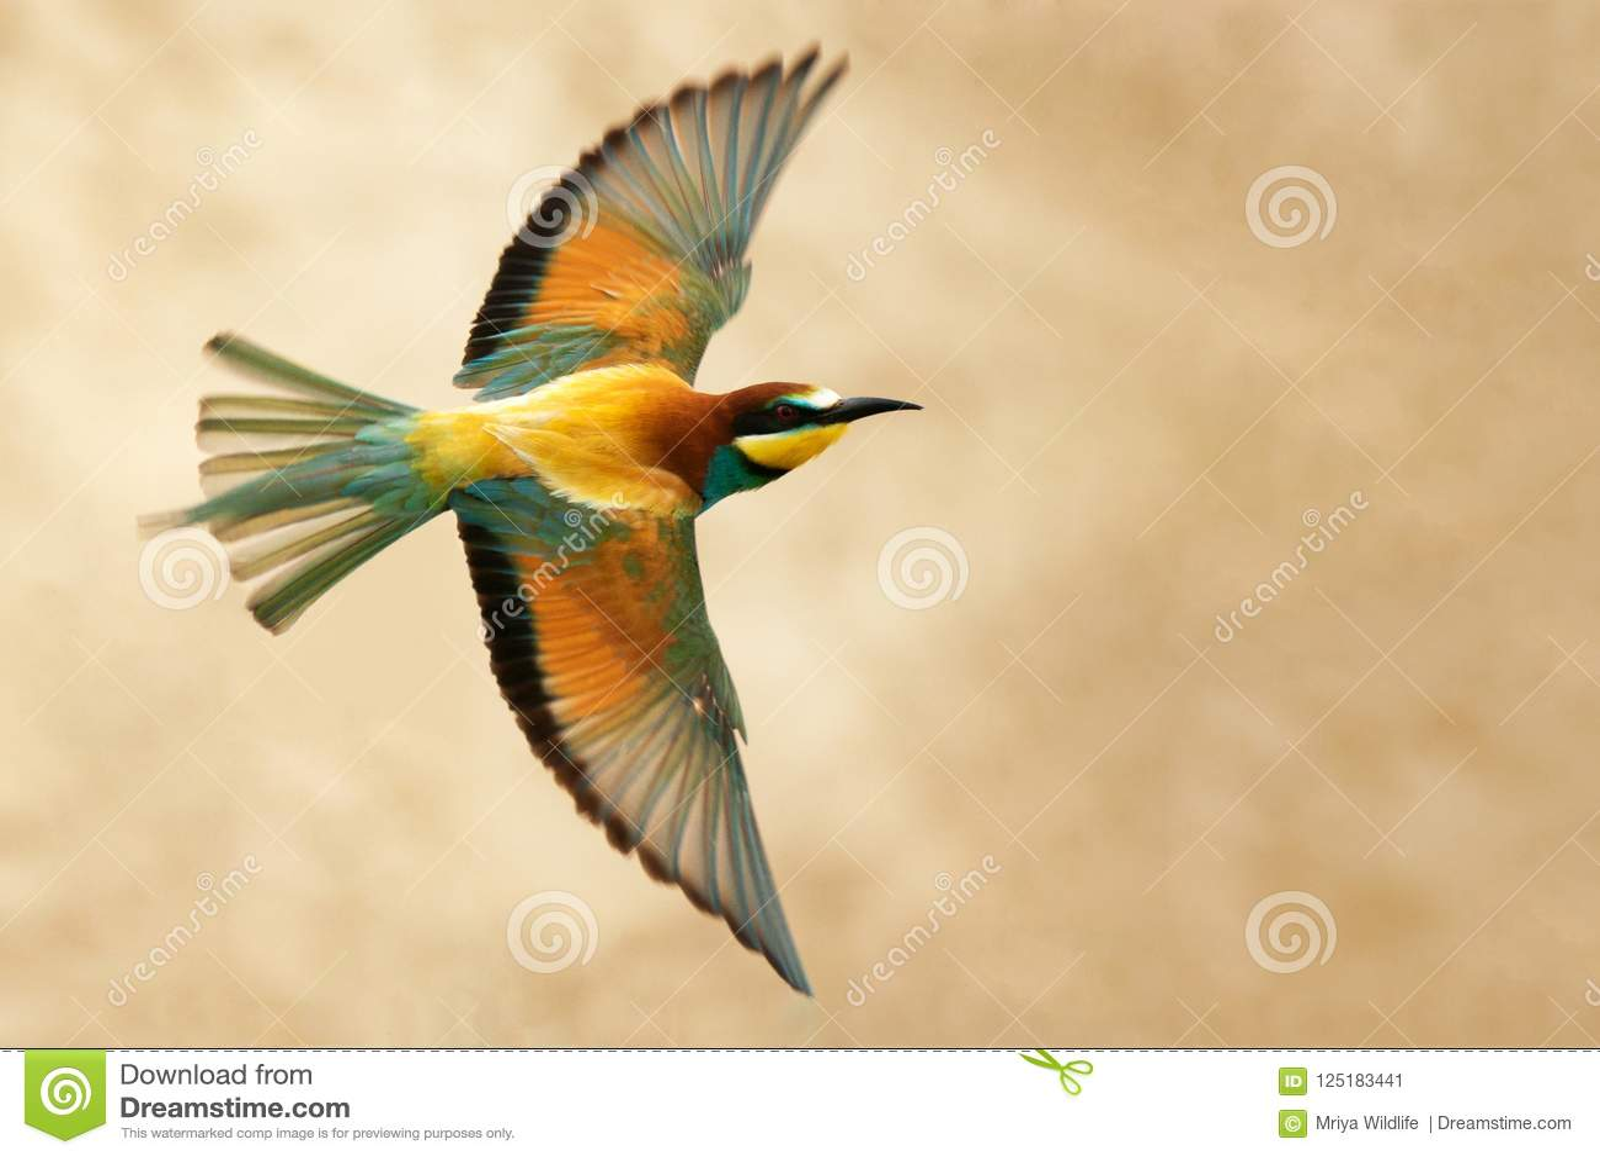 European bee-eater in flight on a beautiful background